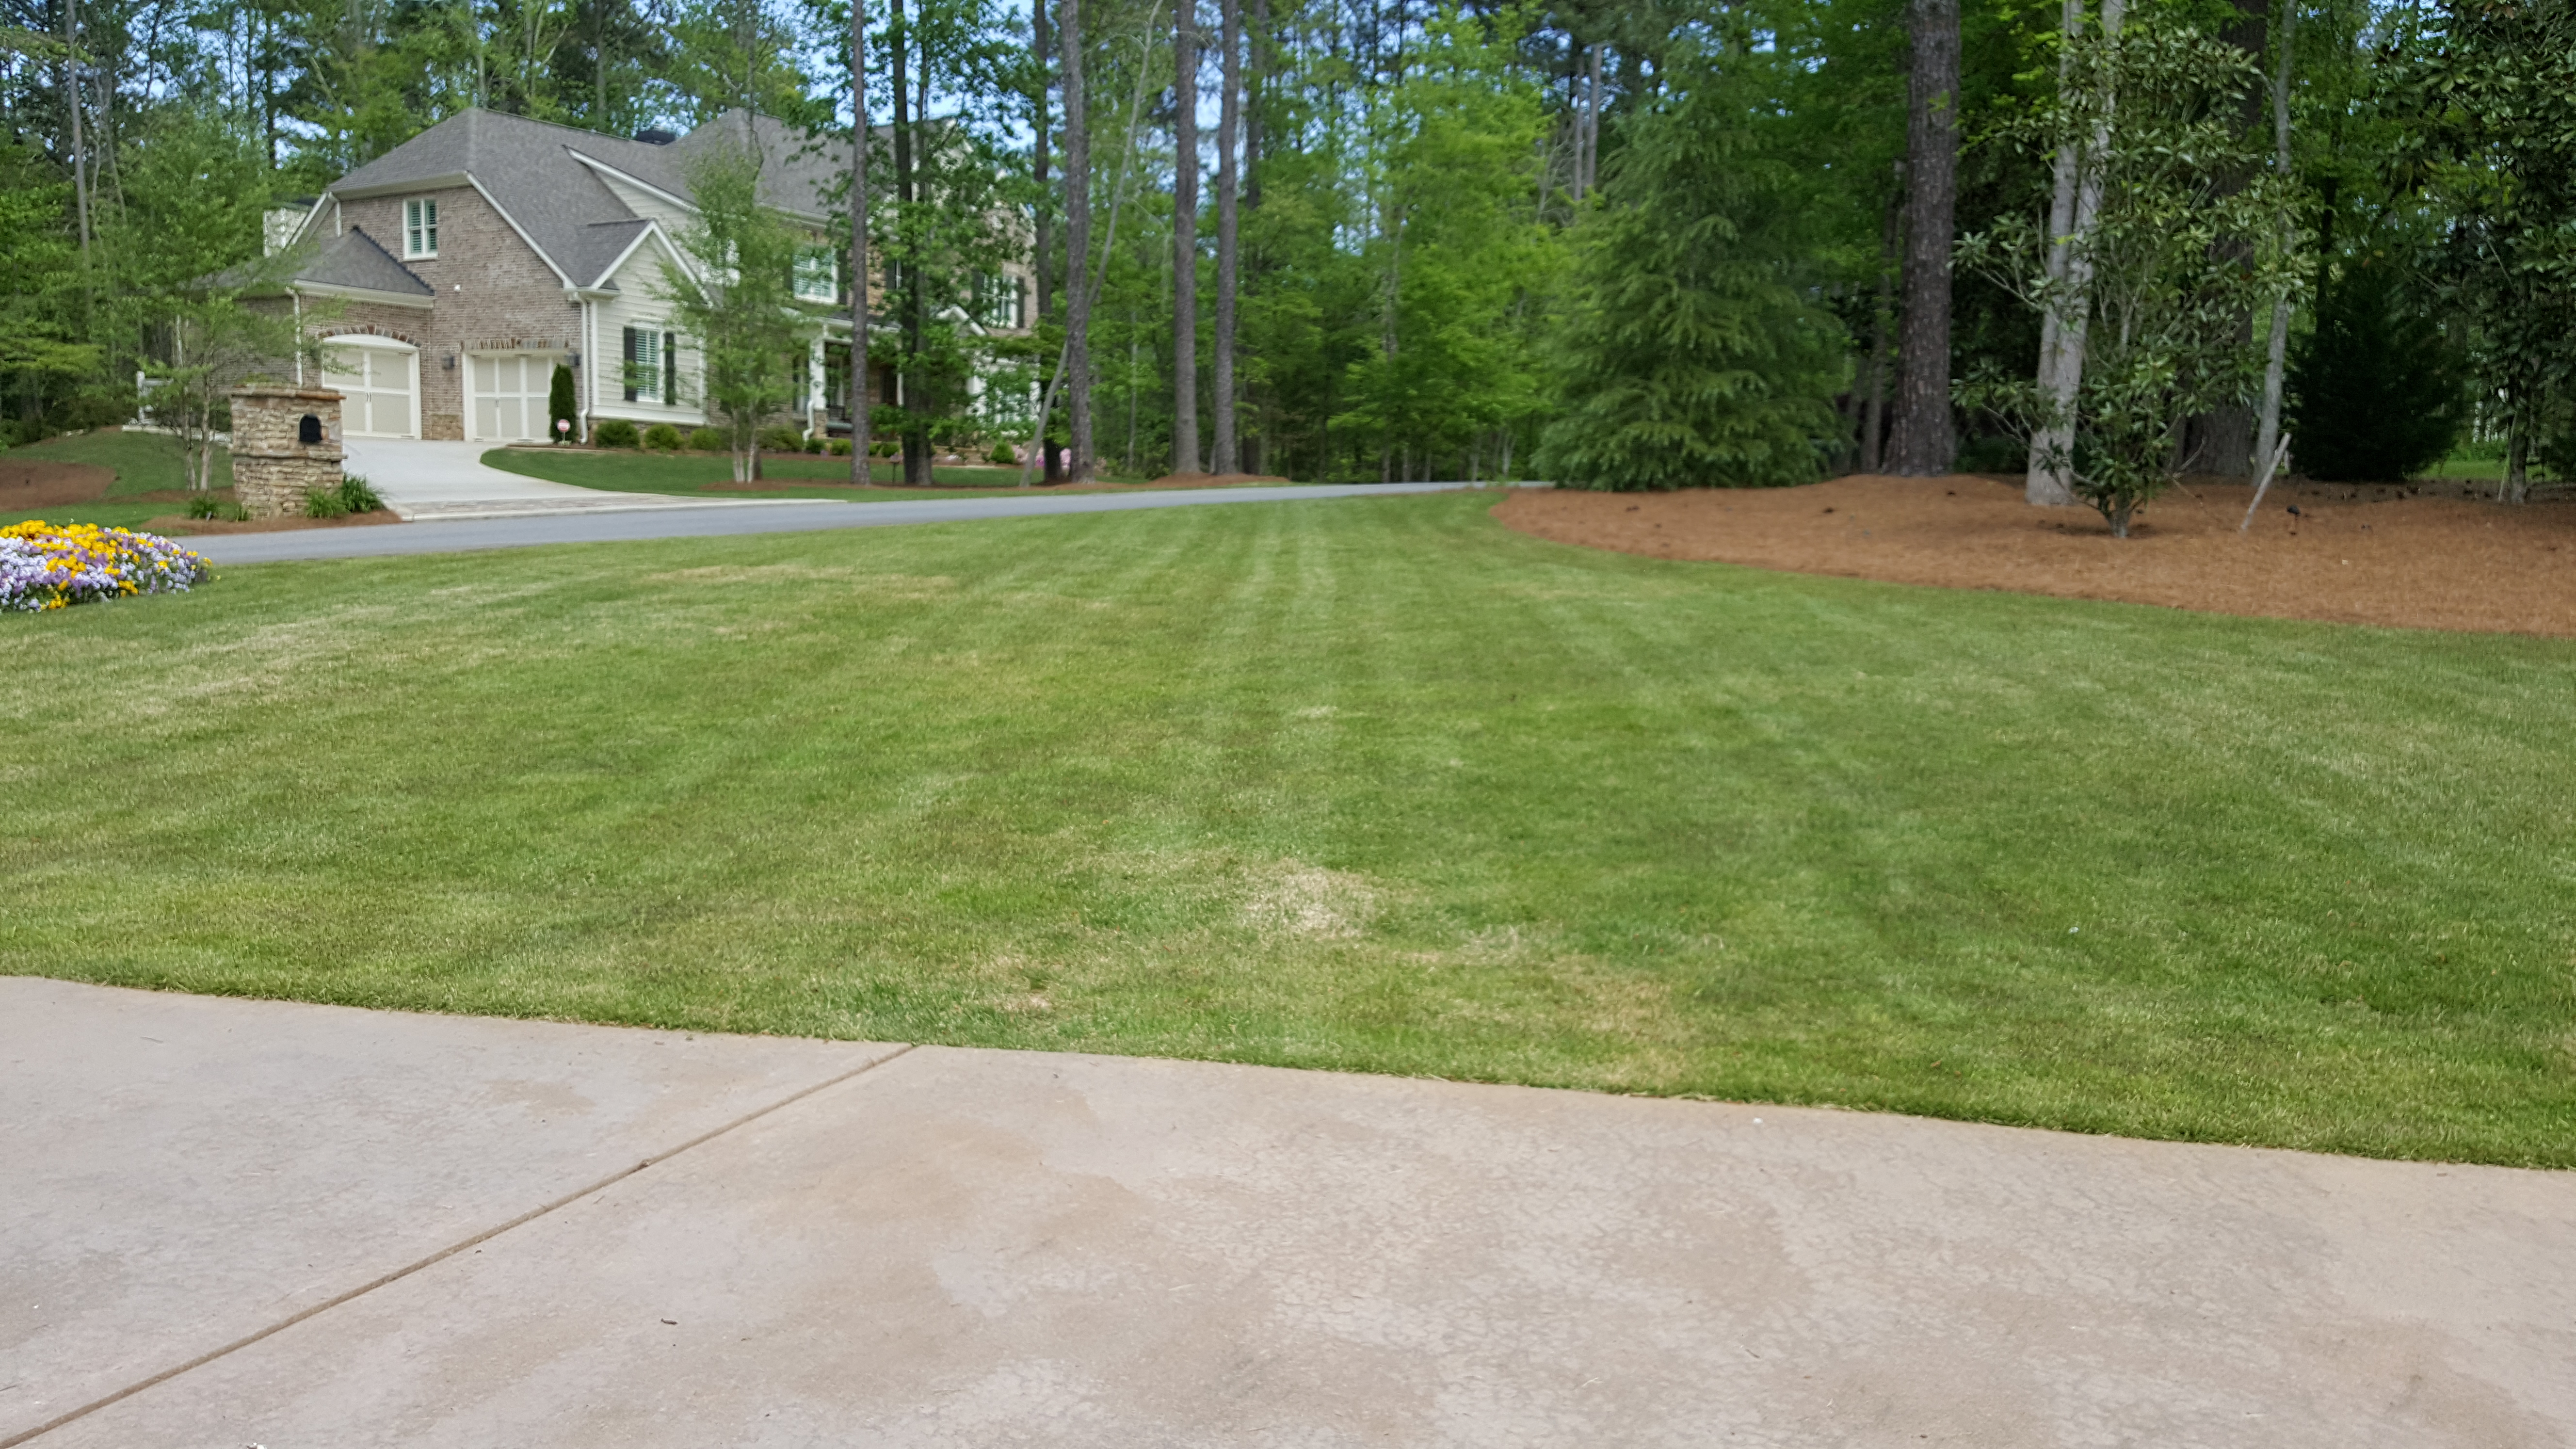 Lawn Mowing Contractor in Cartersville, GA, 30120